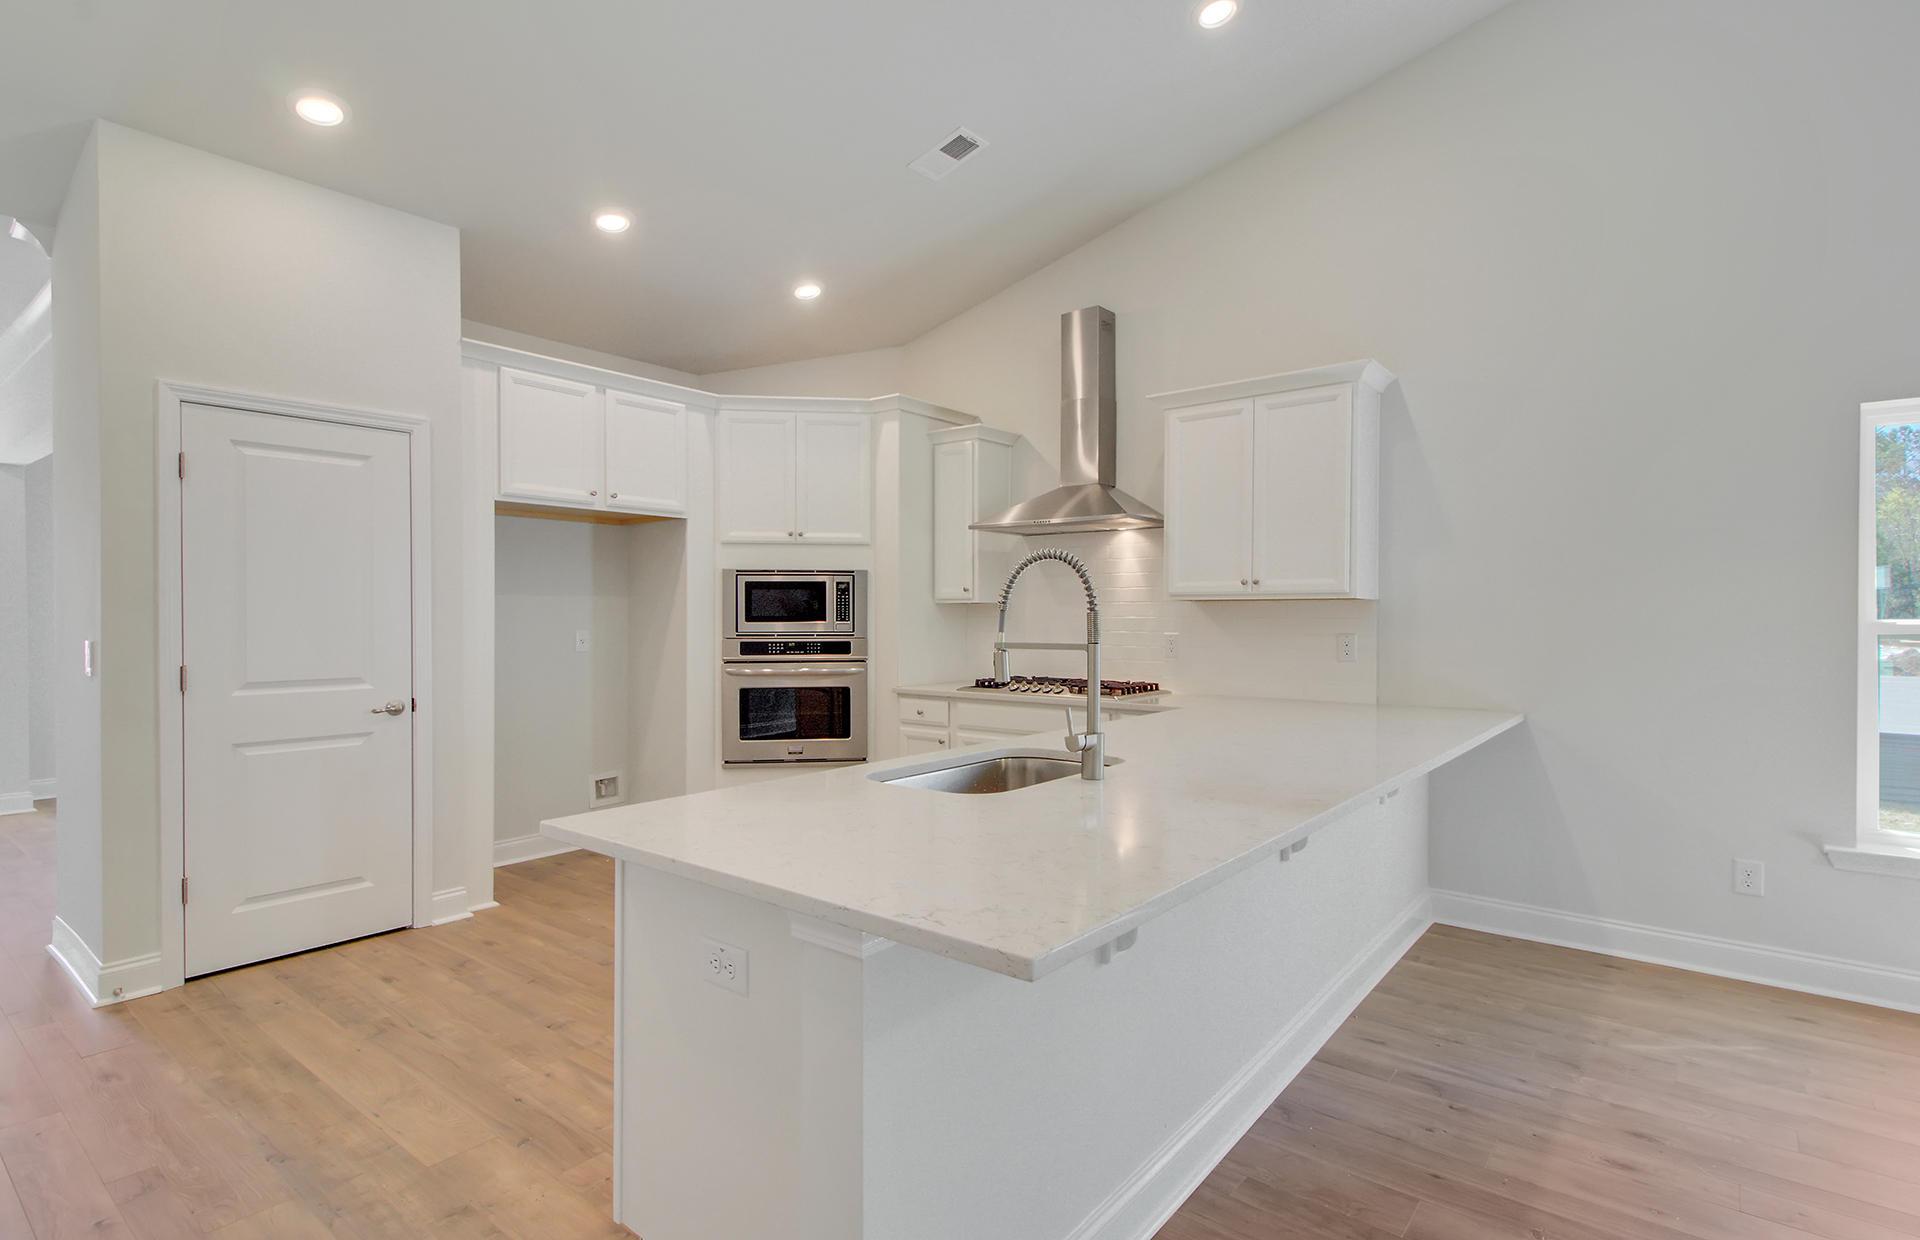 Park West Homes For Sale - 3062 Rice Field, Mount Pleasant, SC - 11